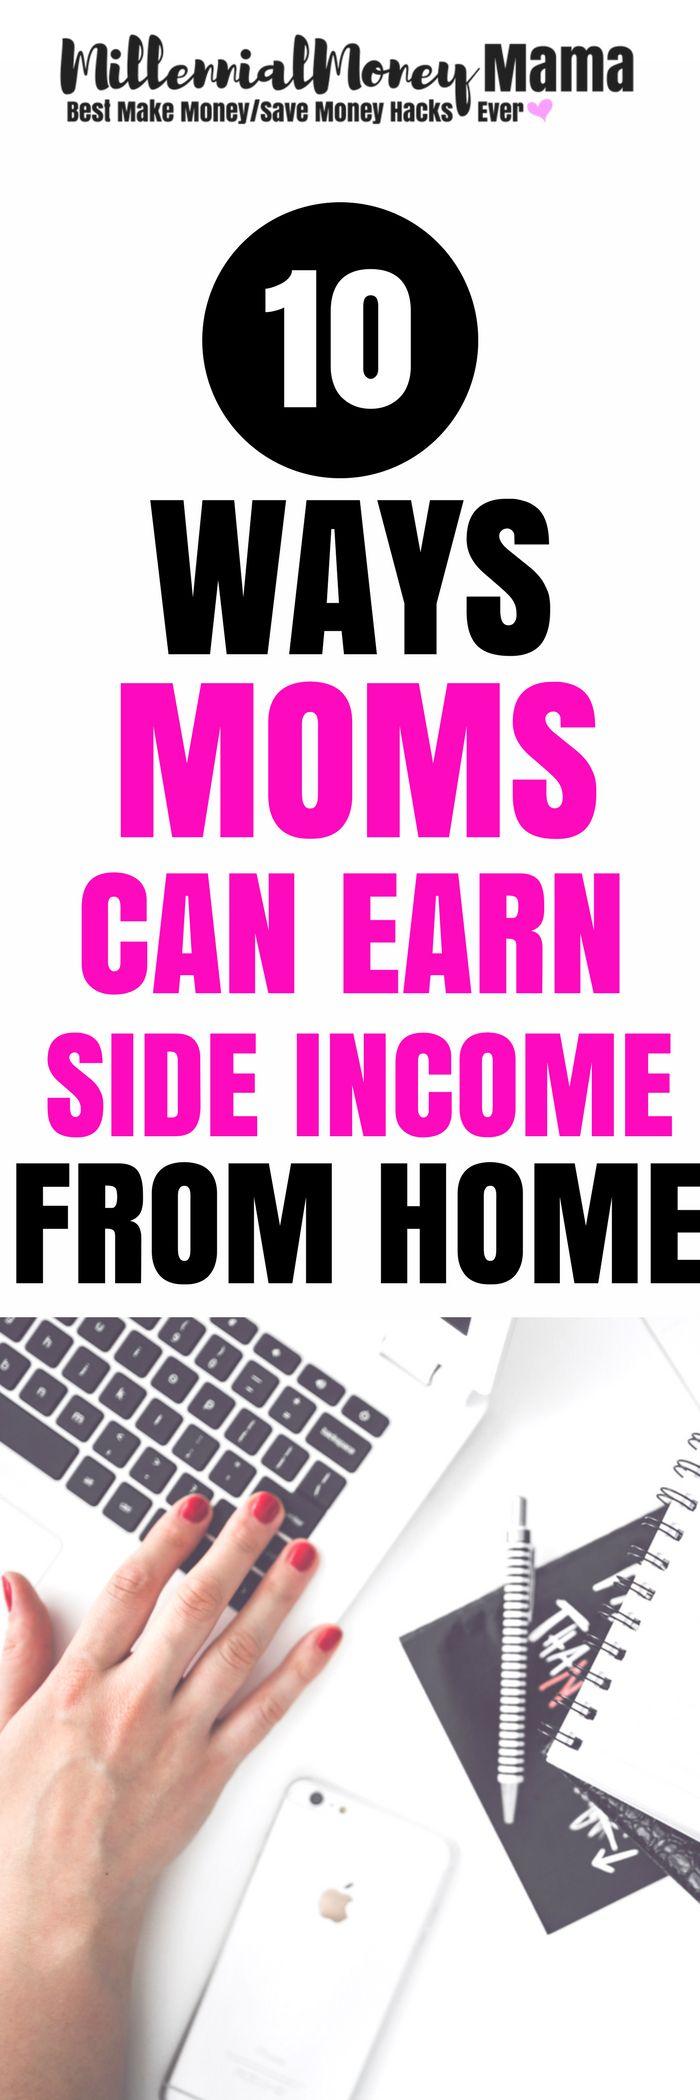 10 ways moms can earn side income from home #MAKEMONEYFROMEHOMELEGIT #makemoneyfromhomemoms #workfromhome #workfromhomemoms #sahm #stayathomemom #bloggingformoney #makemoneyonline #makemoneyonlinelegit